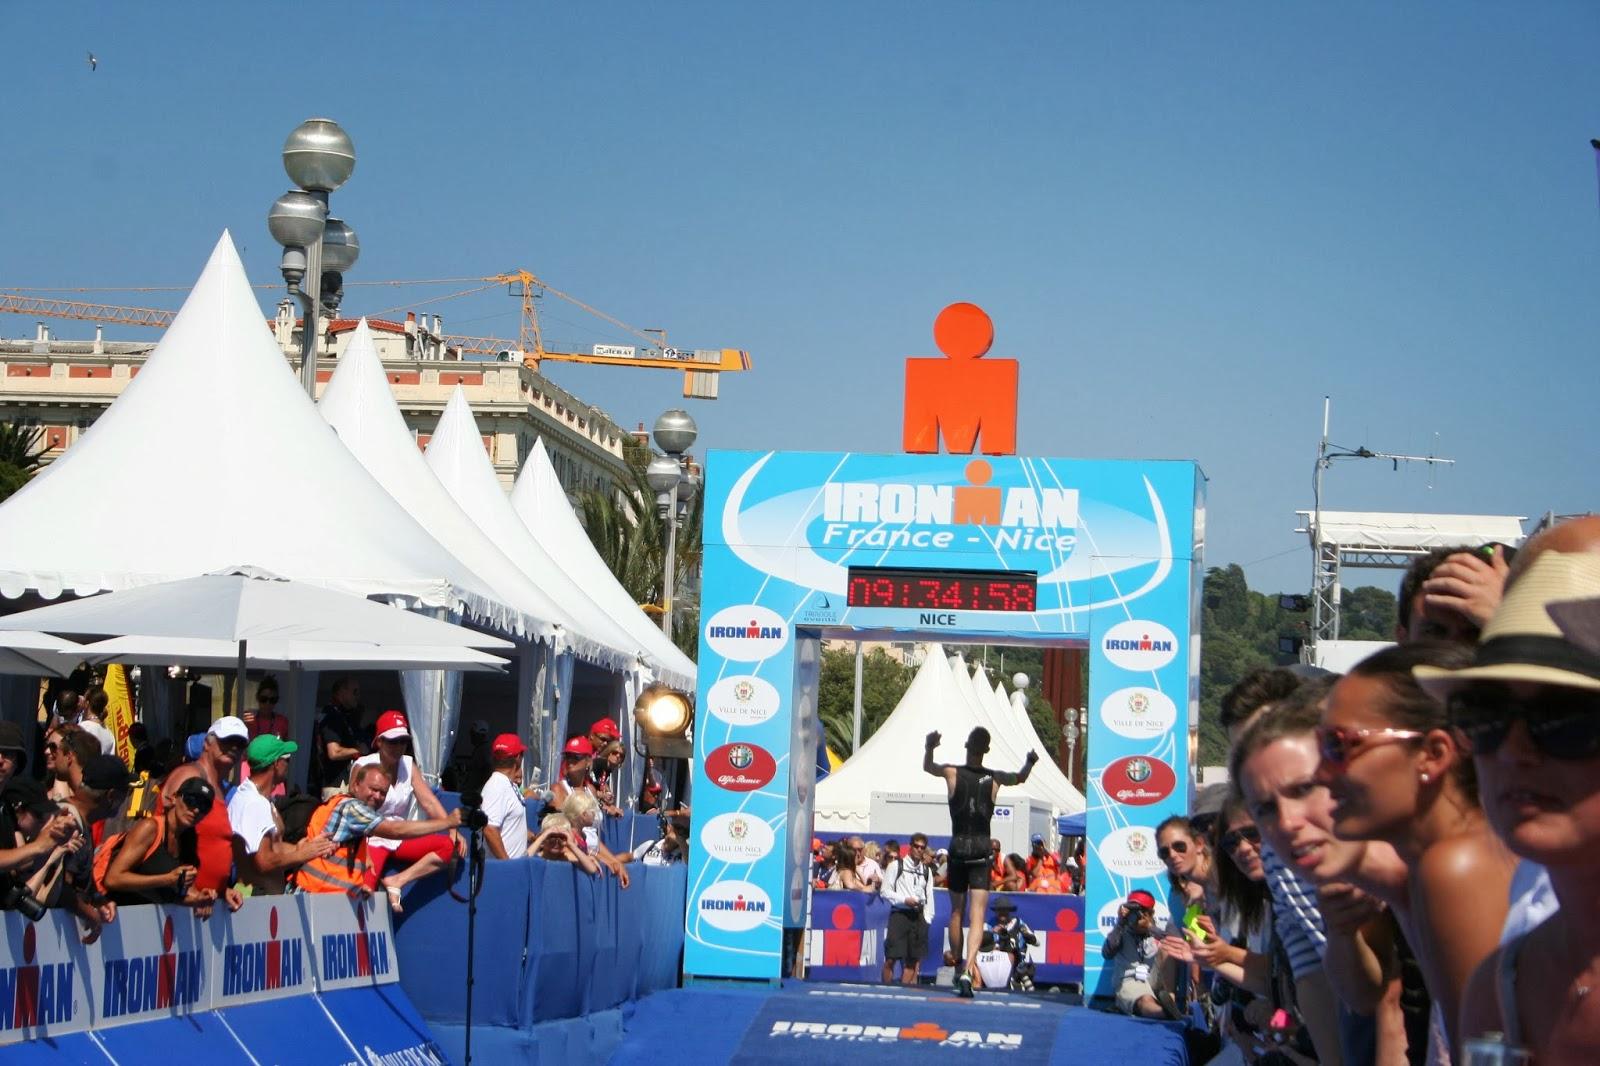 Ironman france slots